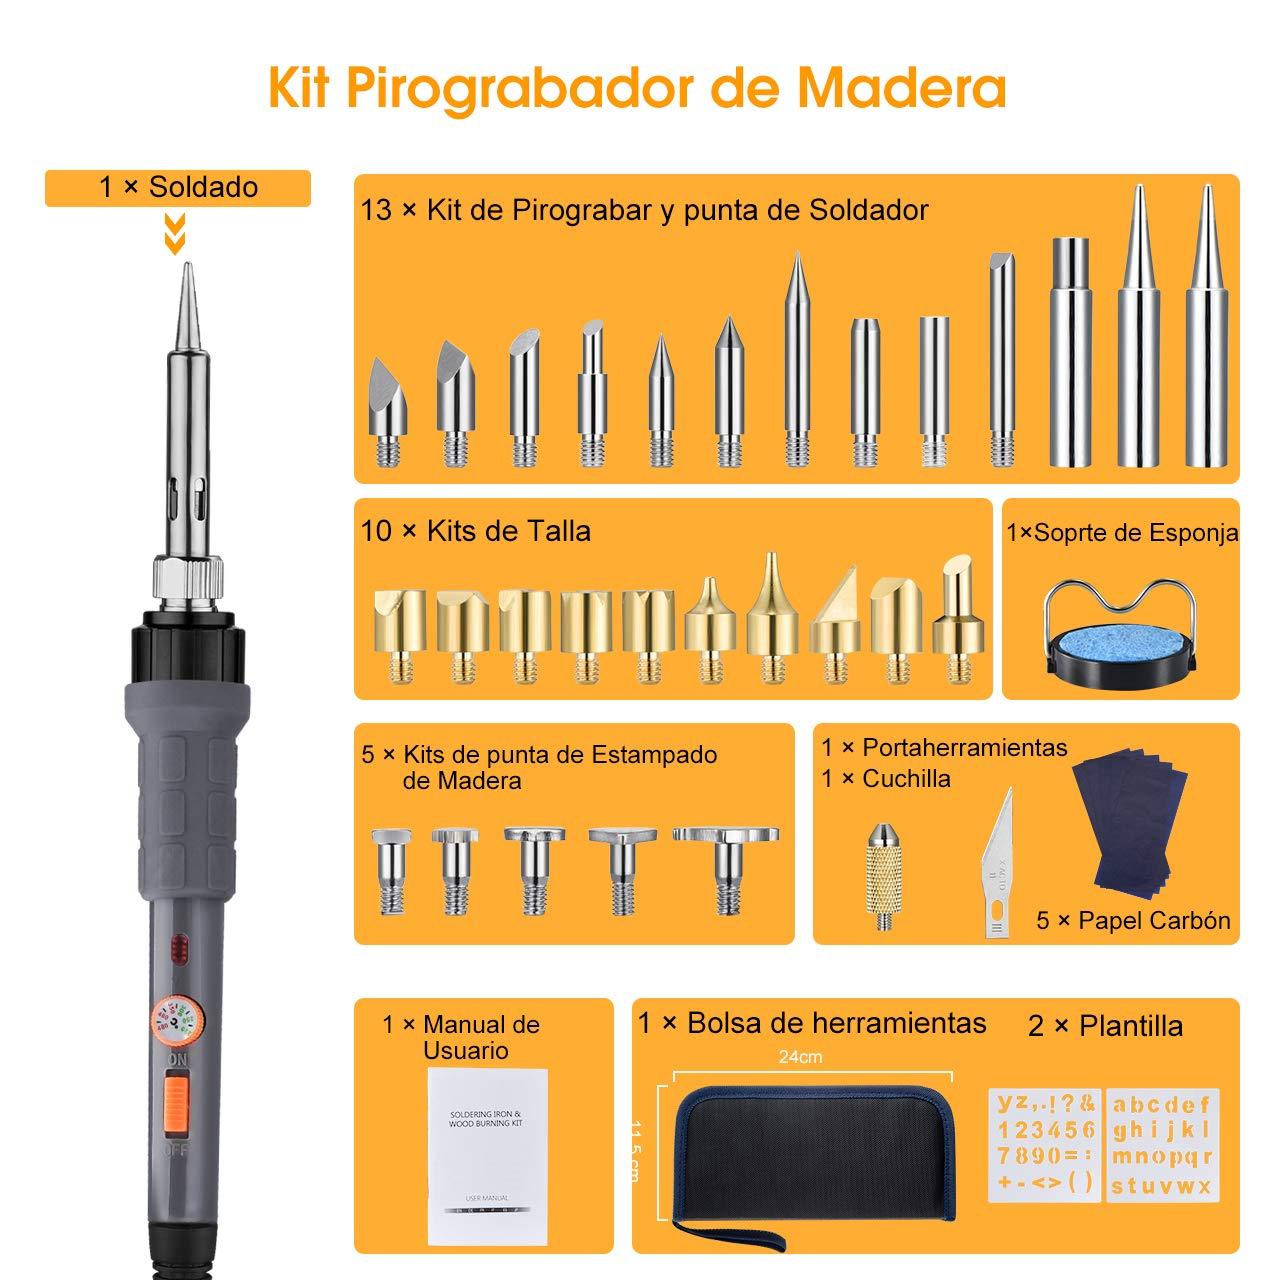 Holife 41 PCs Kit de Pirograbador de Madera, 220V/60W Temperatura Ajustable, 140cm Cable de Carga, 5 Papeles de Copia + 2 Plantillas,Soldador Pirografo ...